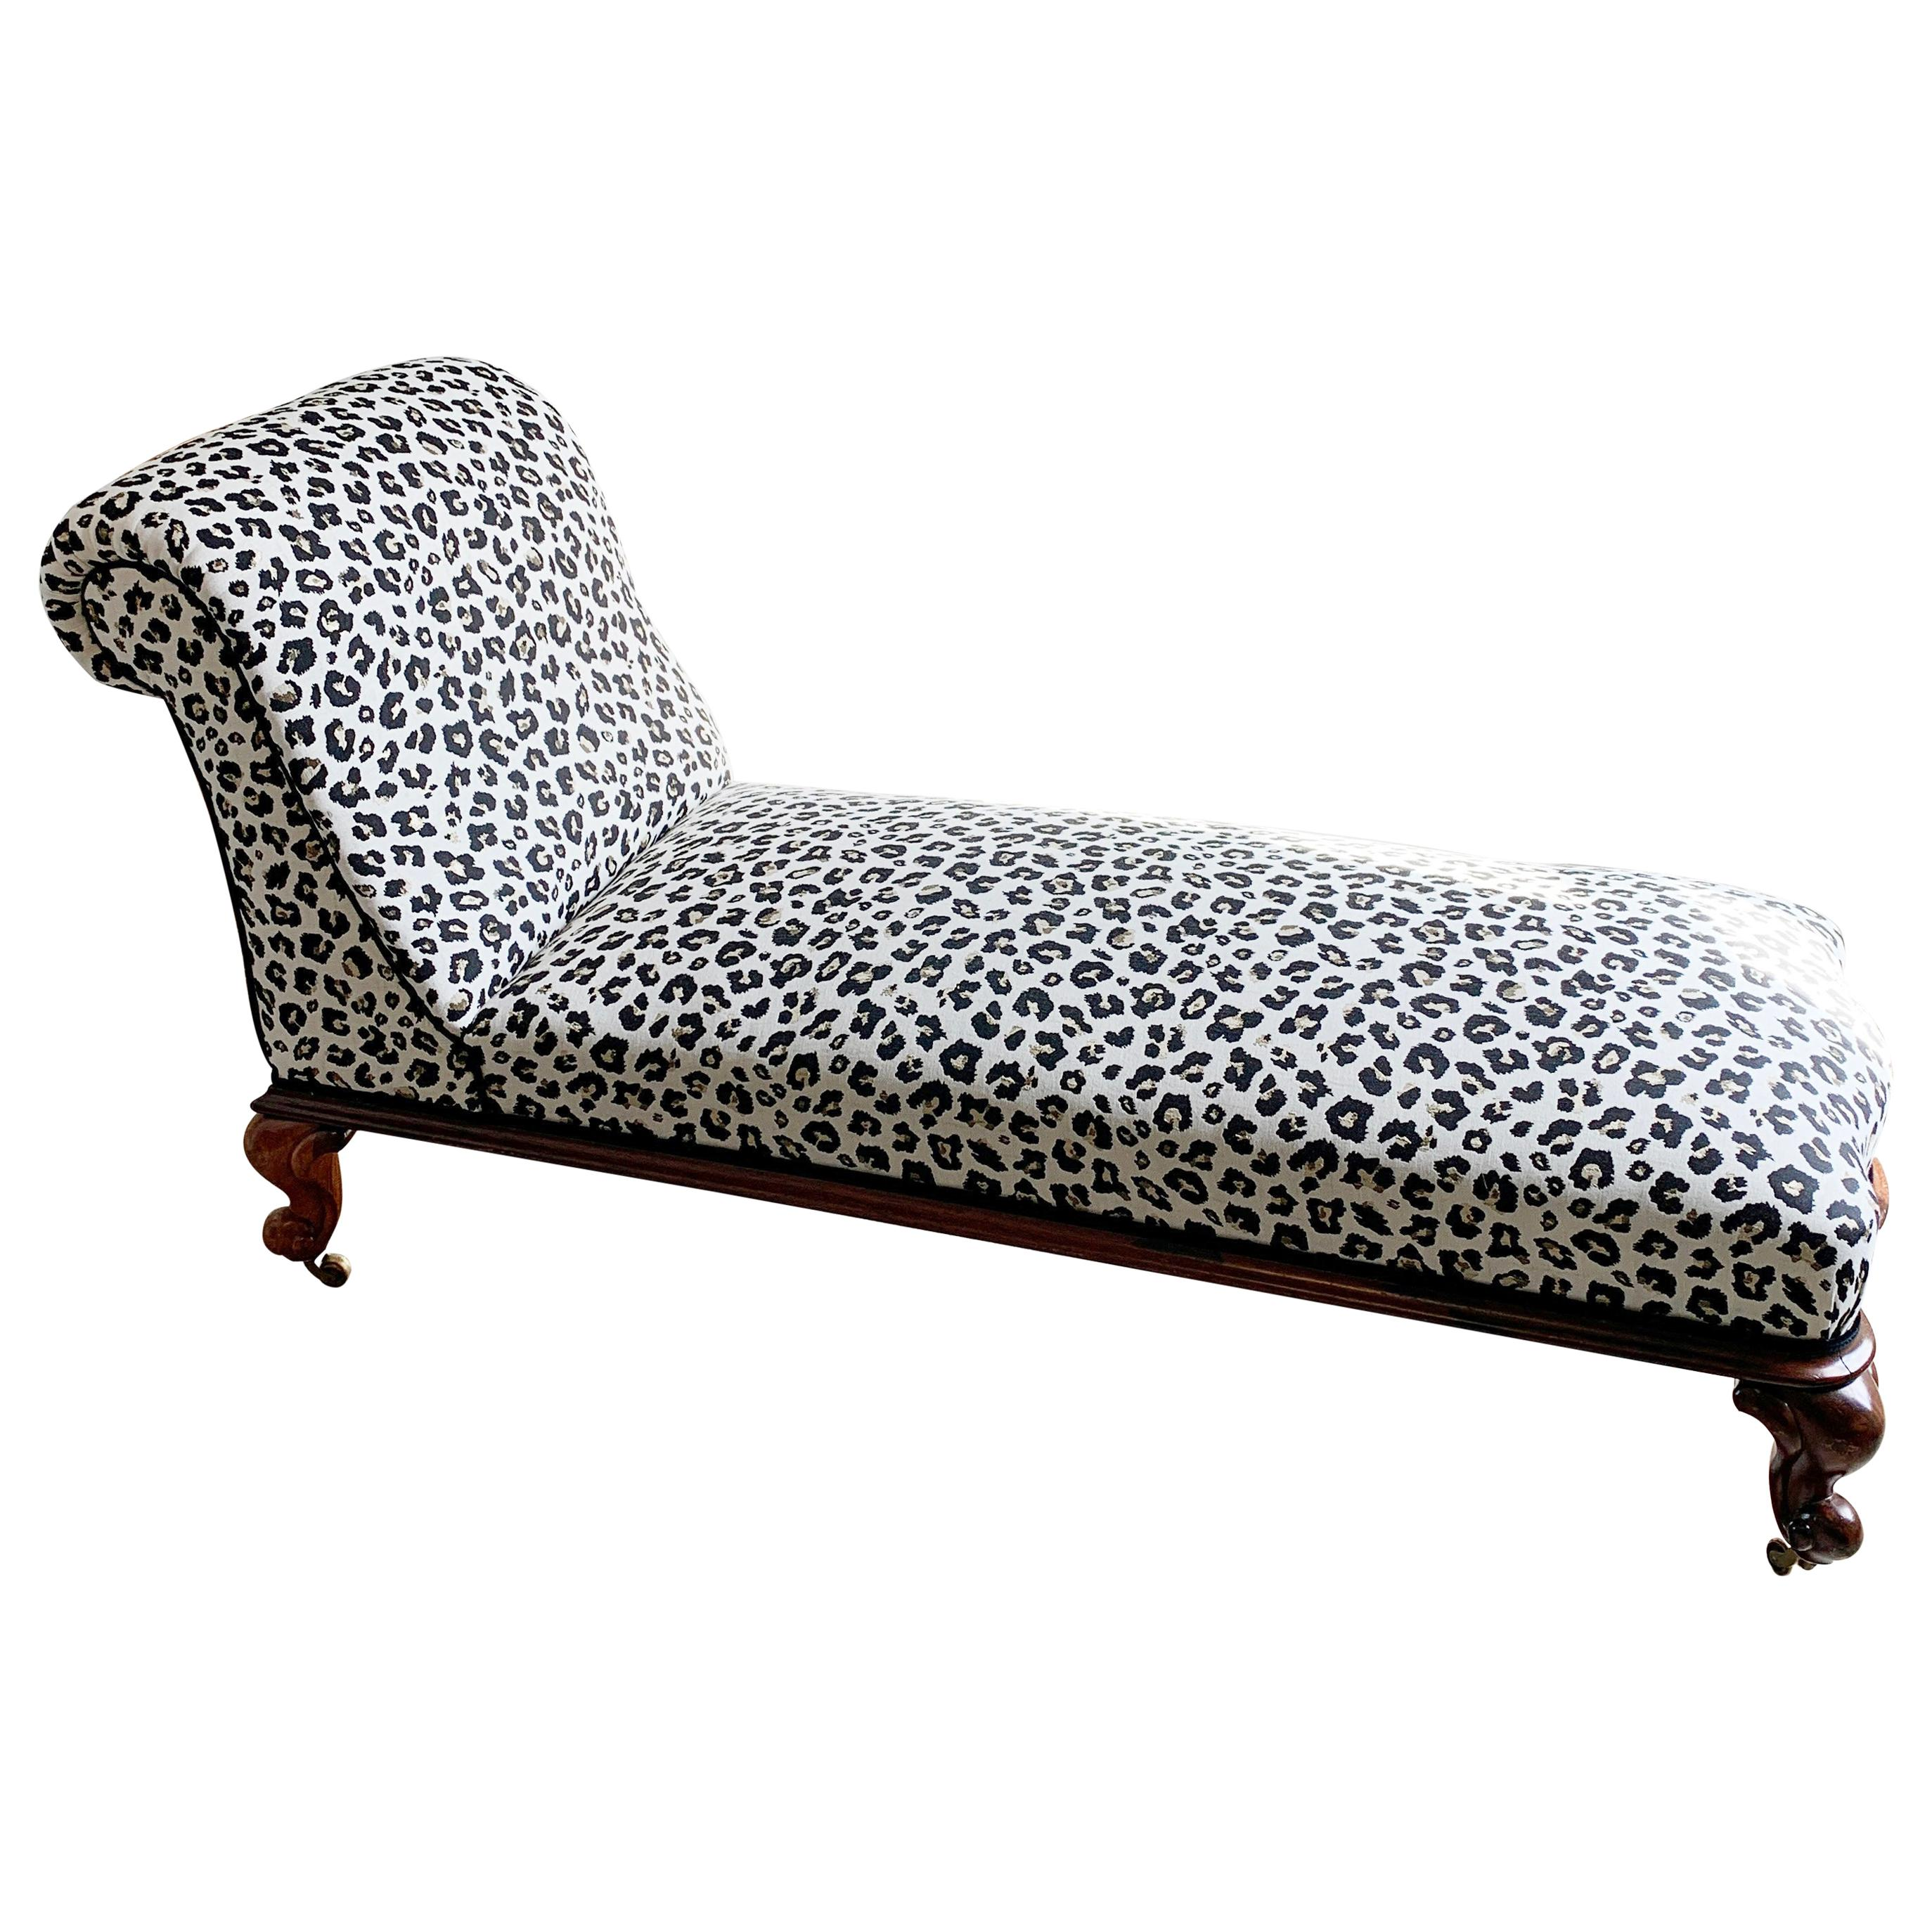 Antique Victorian Chaise Longue in Woven Leopard Jacquard